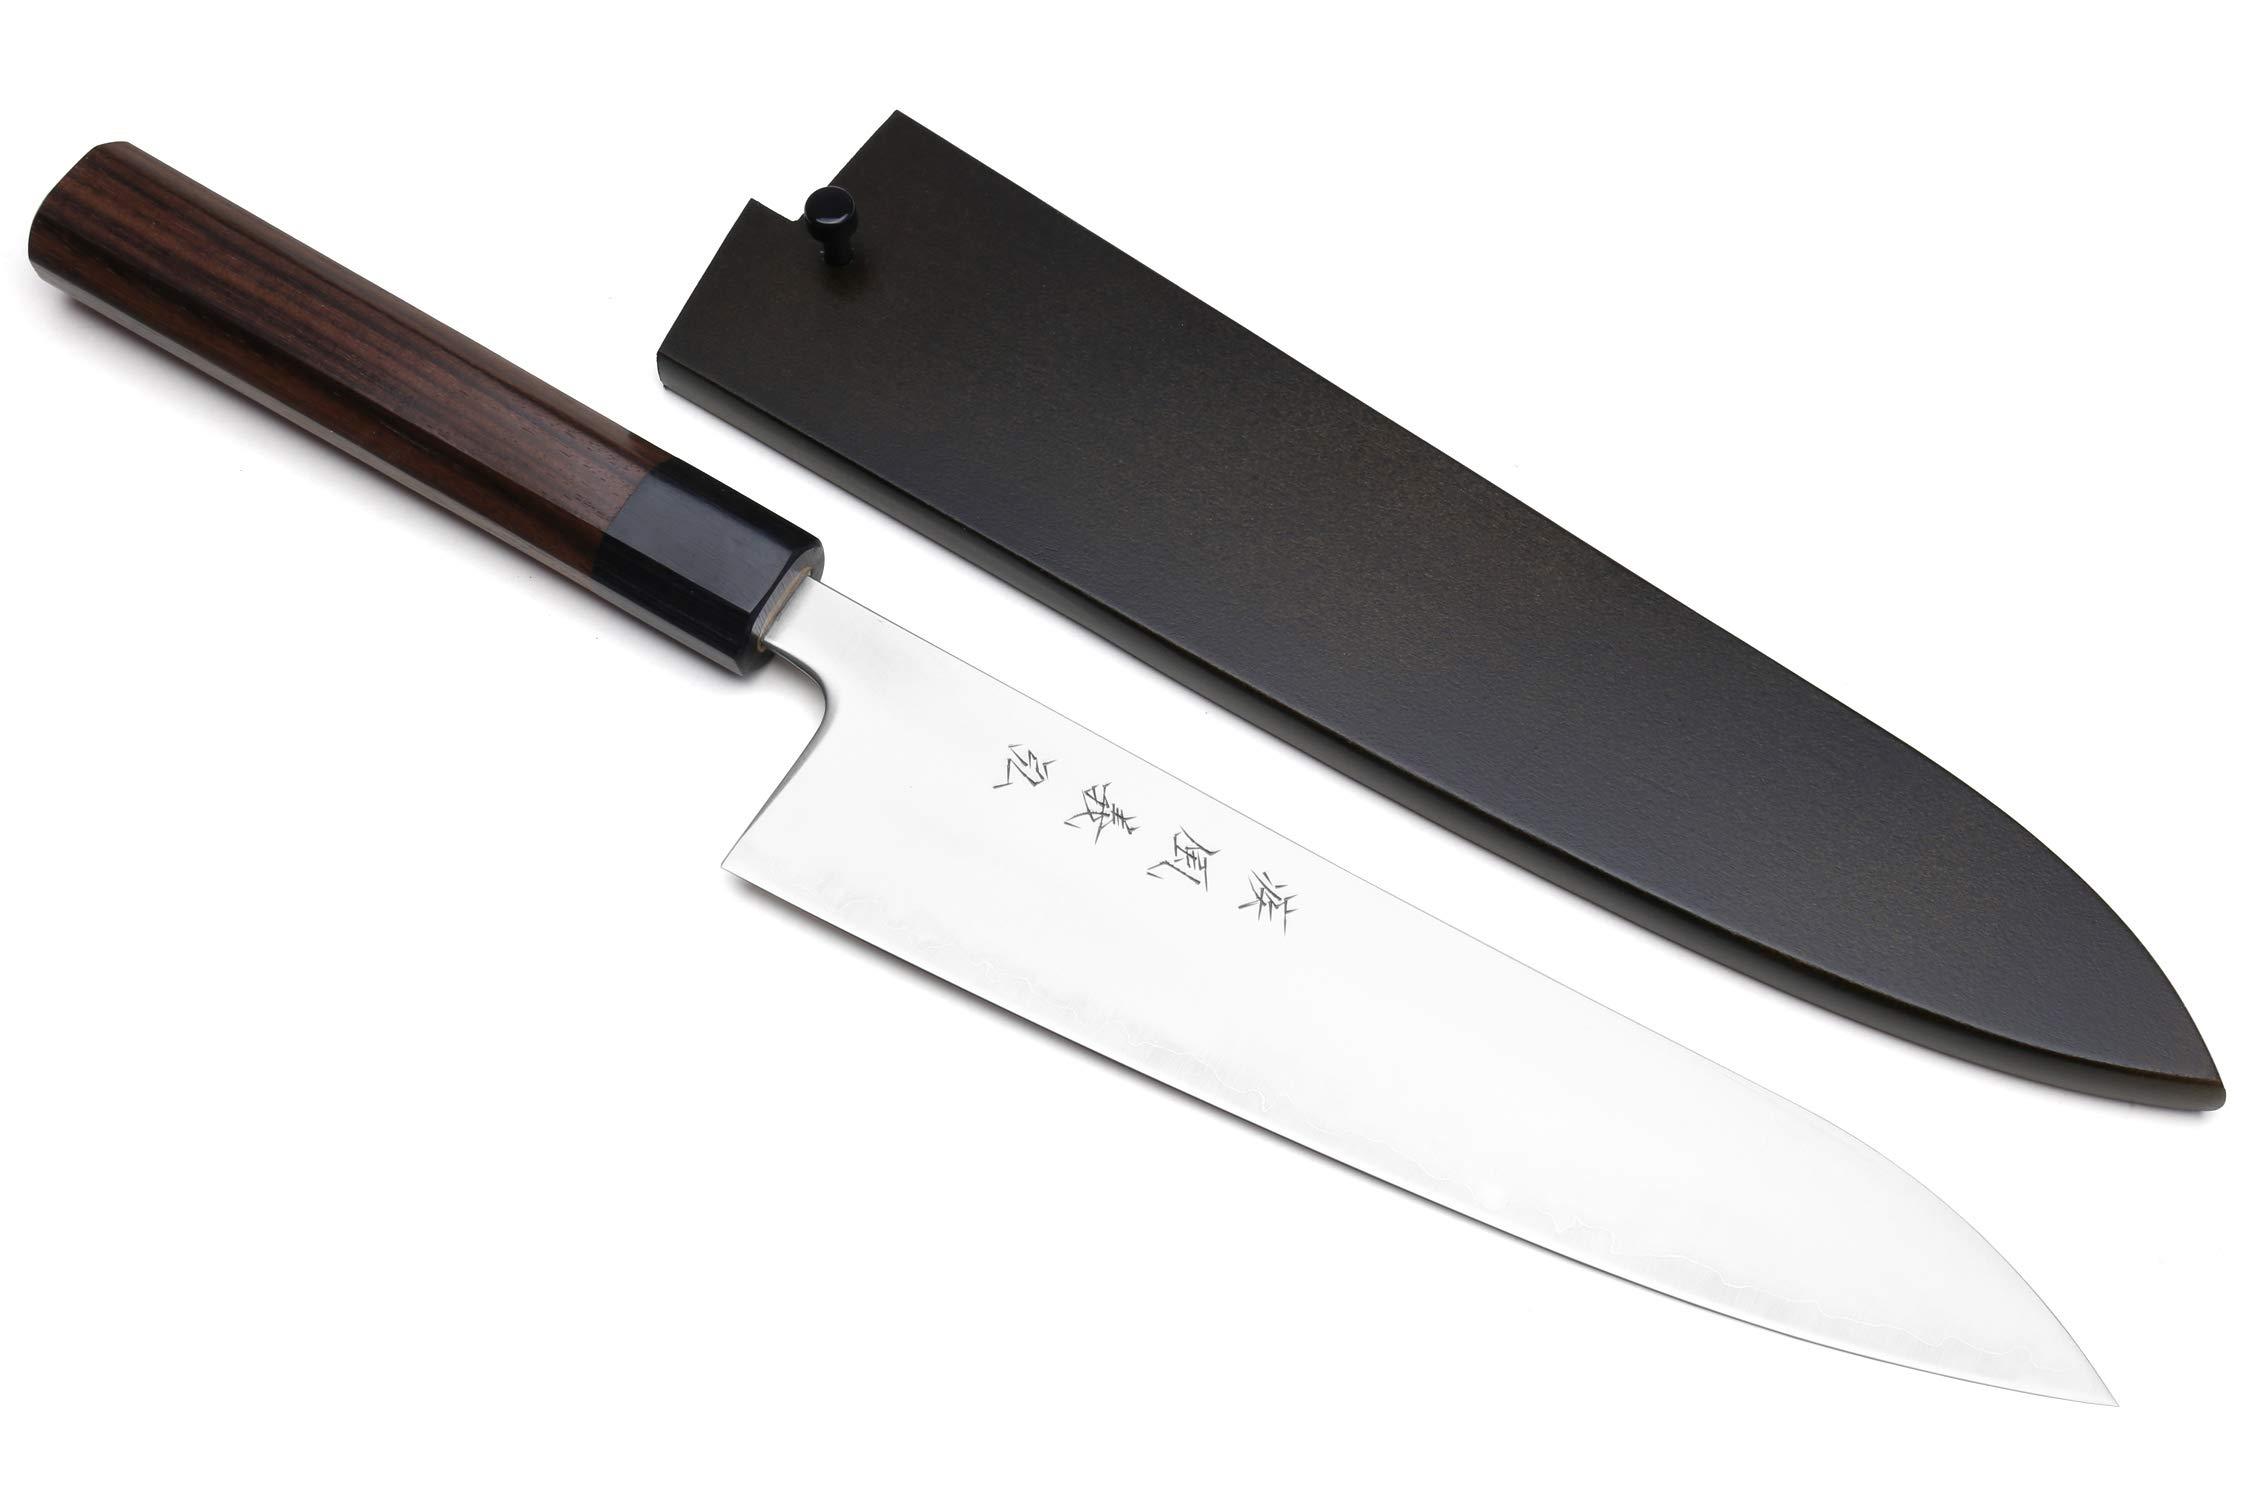 Yoshihiro Super Blue Steel Clad Gyuto Chefs Knife Rosewood Handle (8.25''/210mm) by Yoshihiro